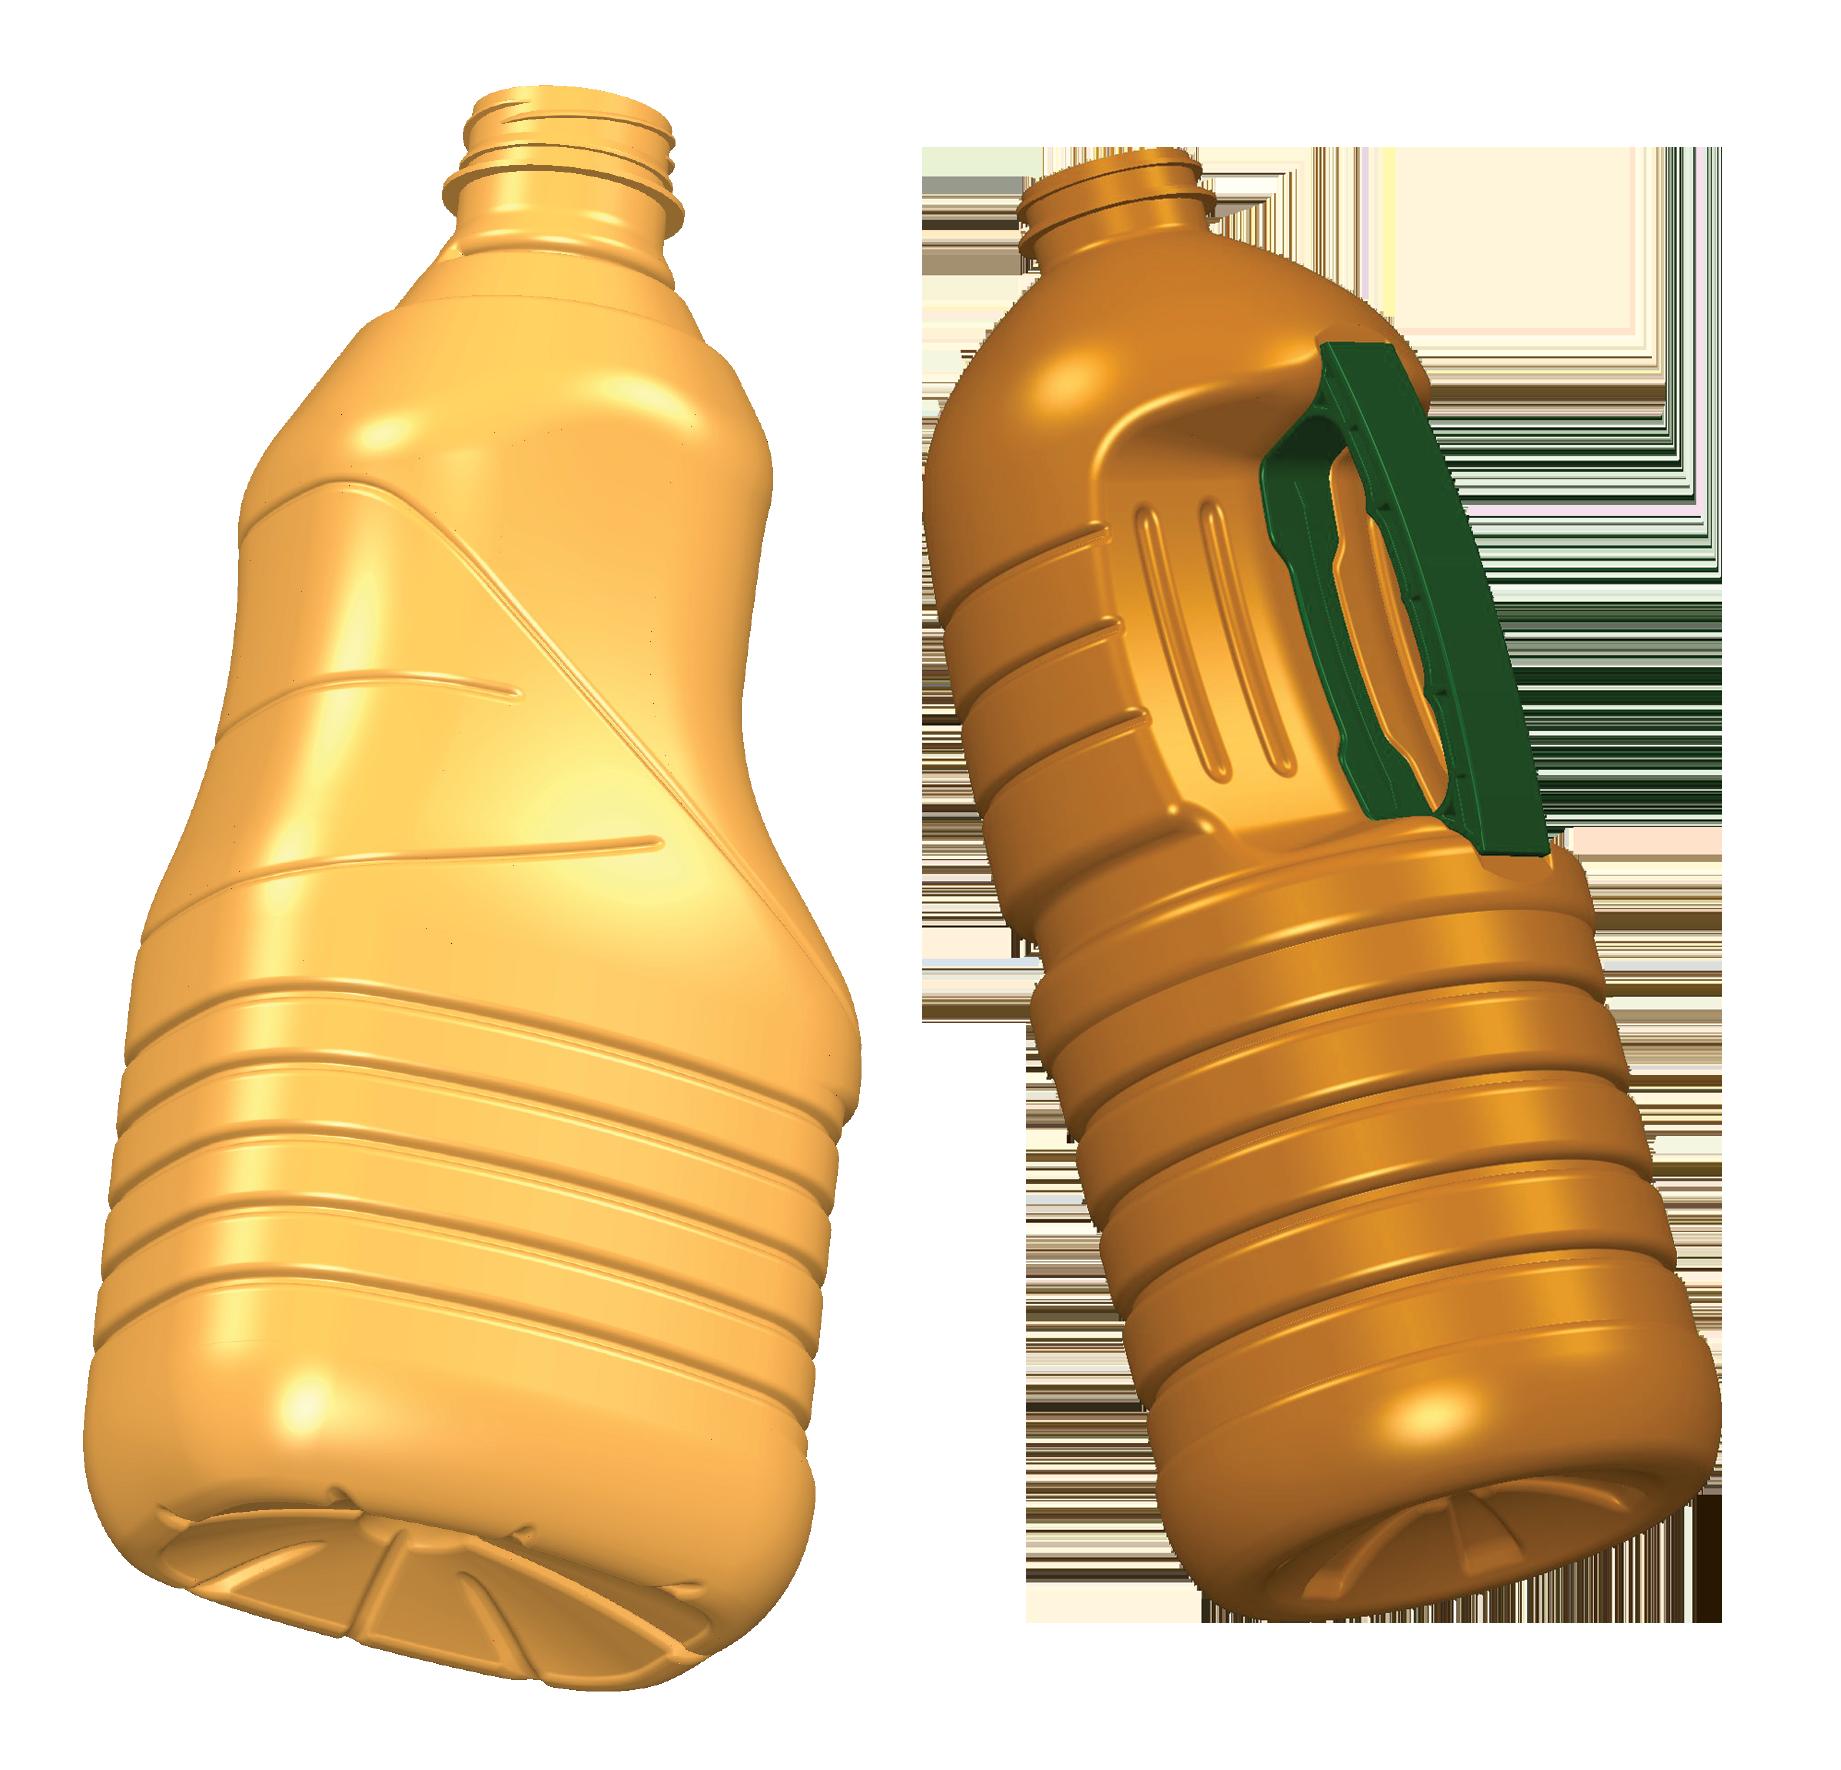 Bottles with built-in handles